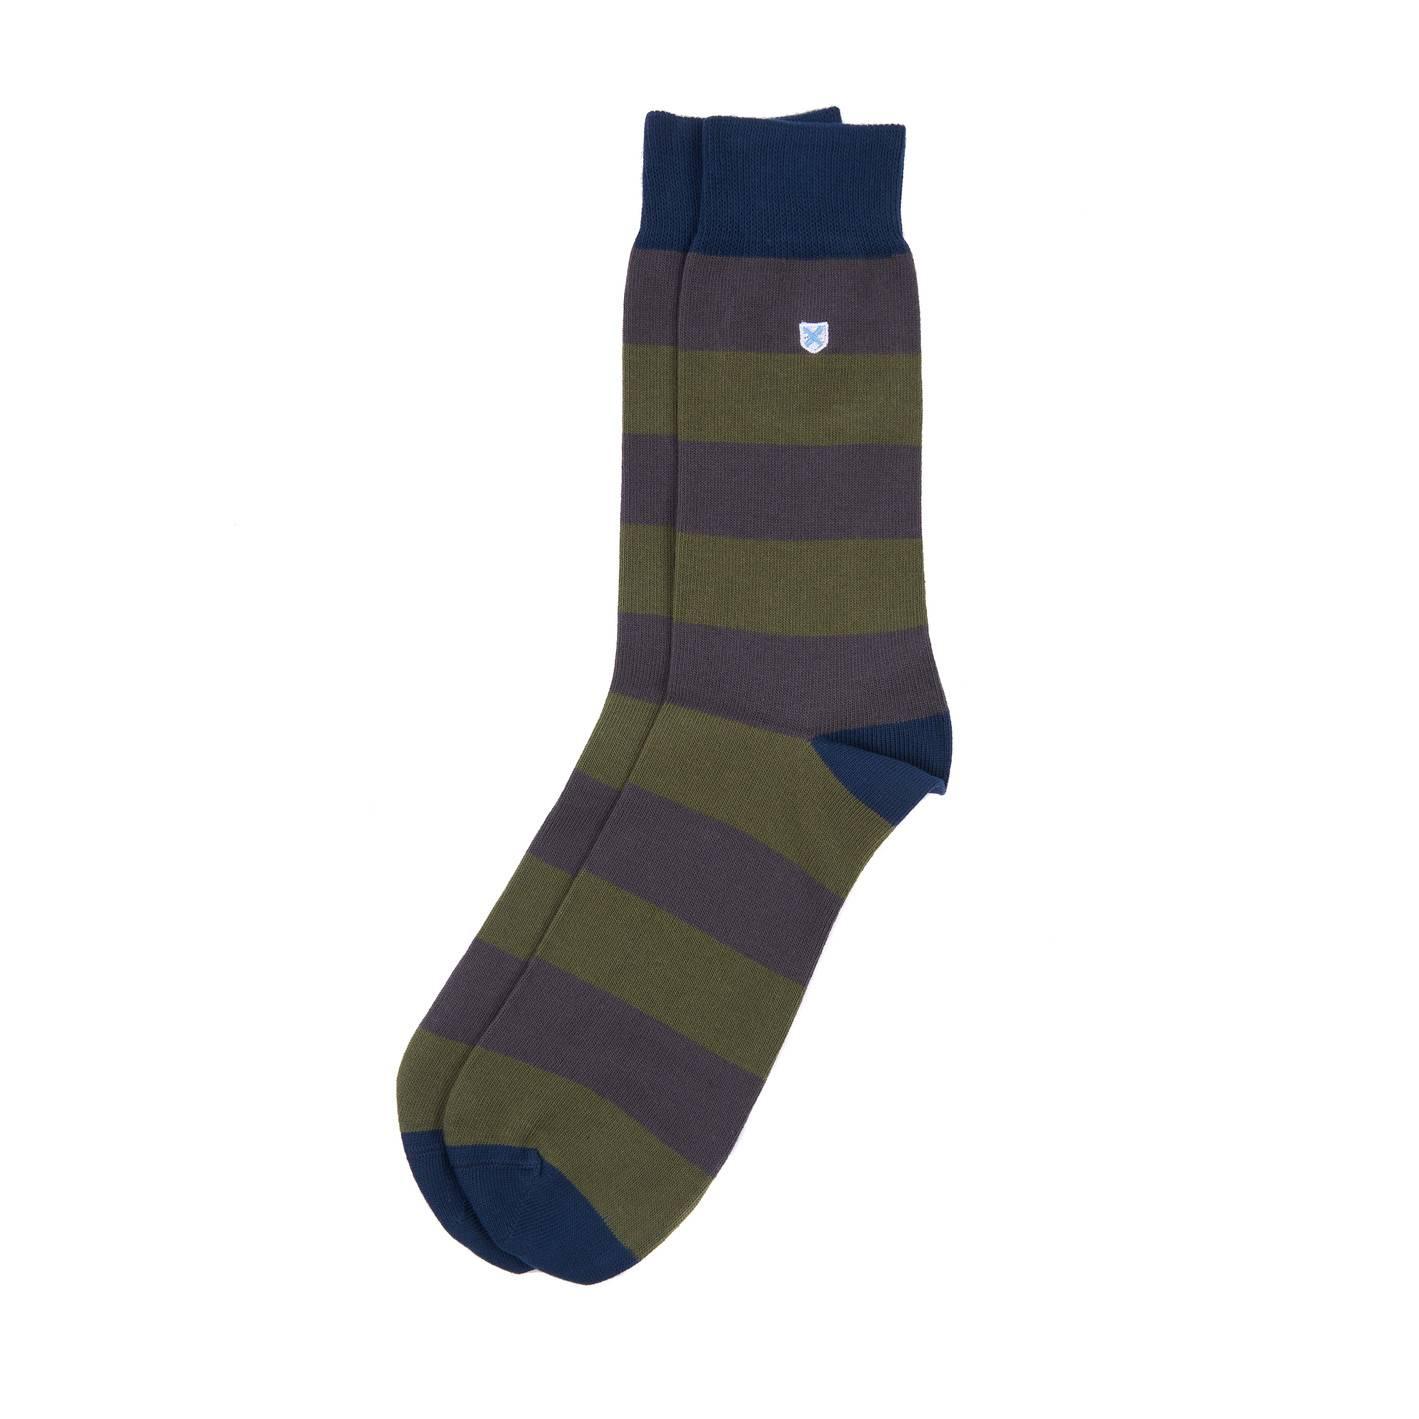 Barbour Oxton Socks - Olive/Grey - L